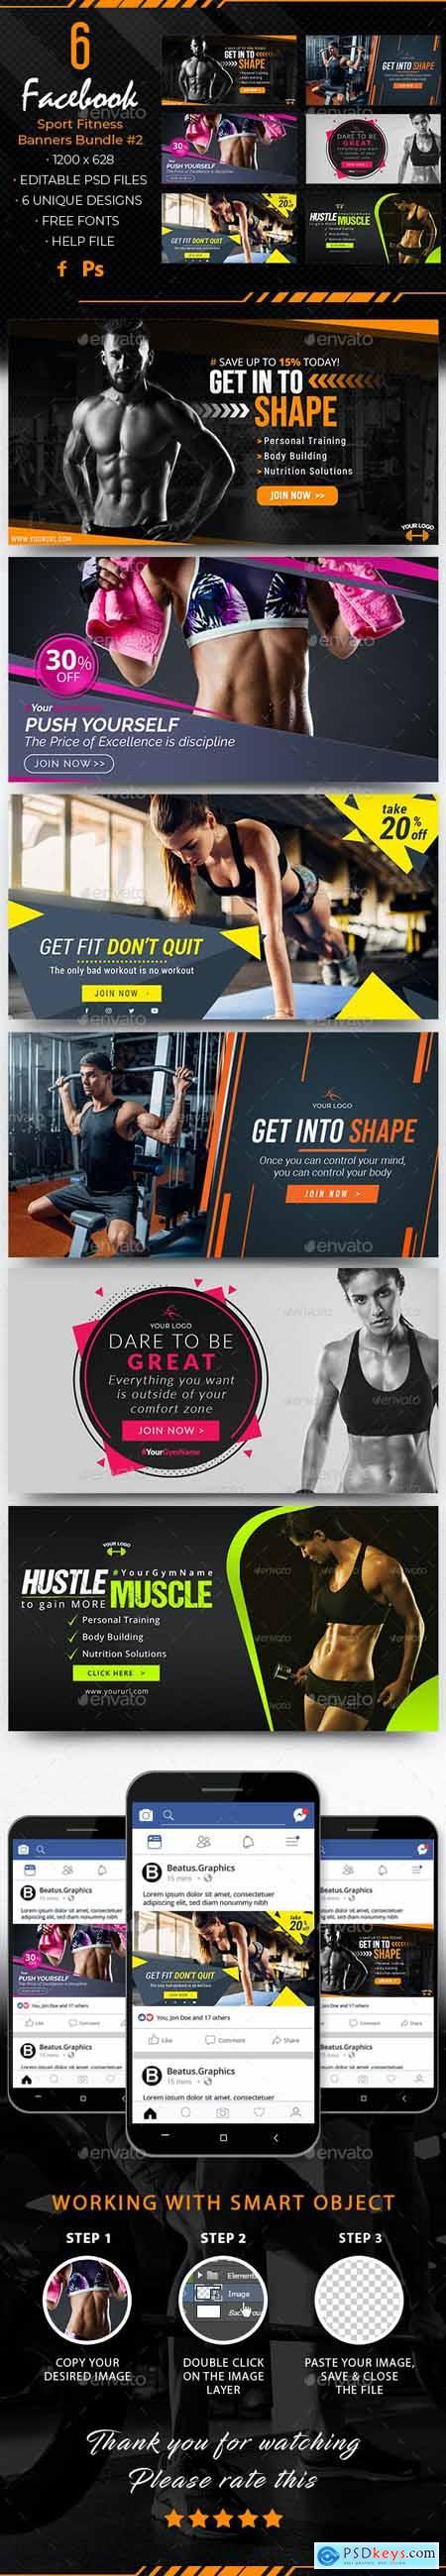 Facebook Sport Fitness Banners 28026747